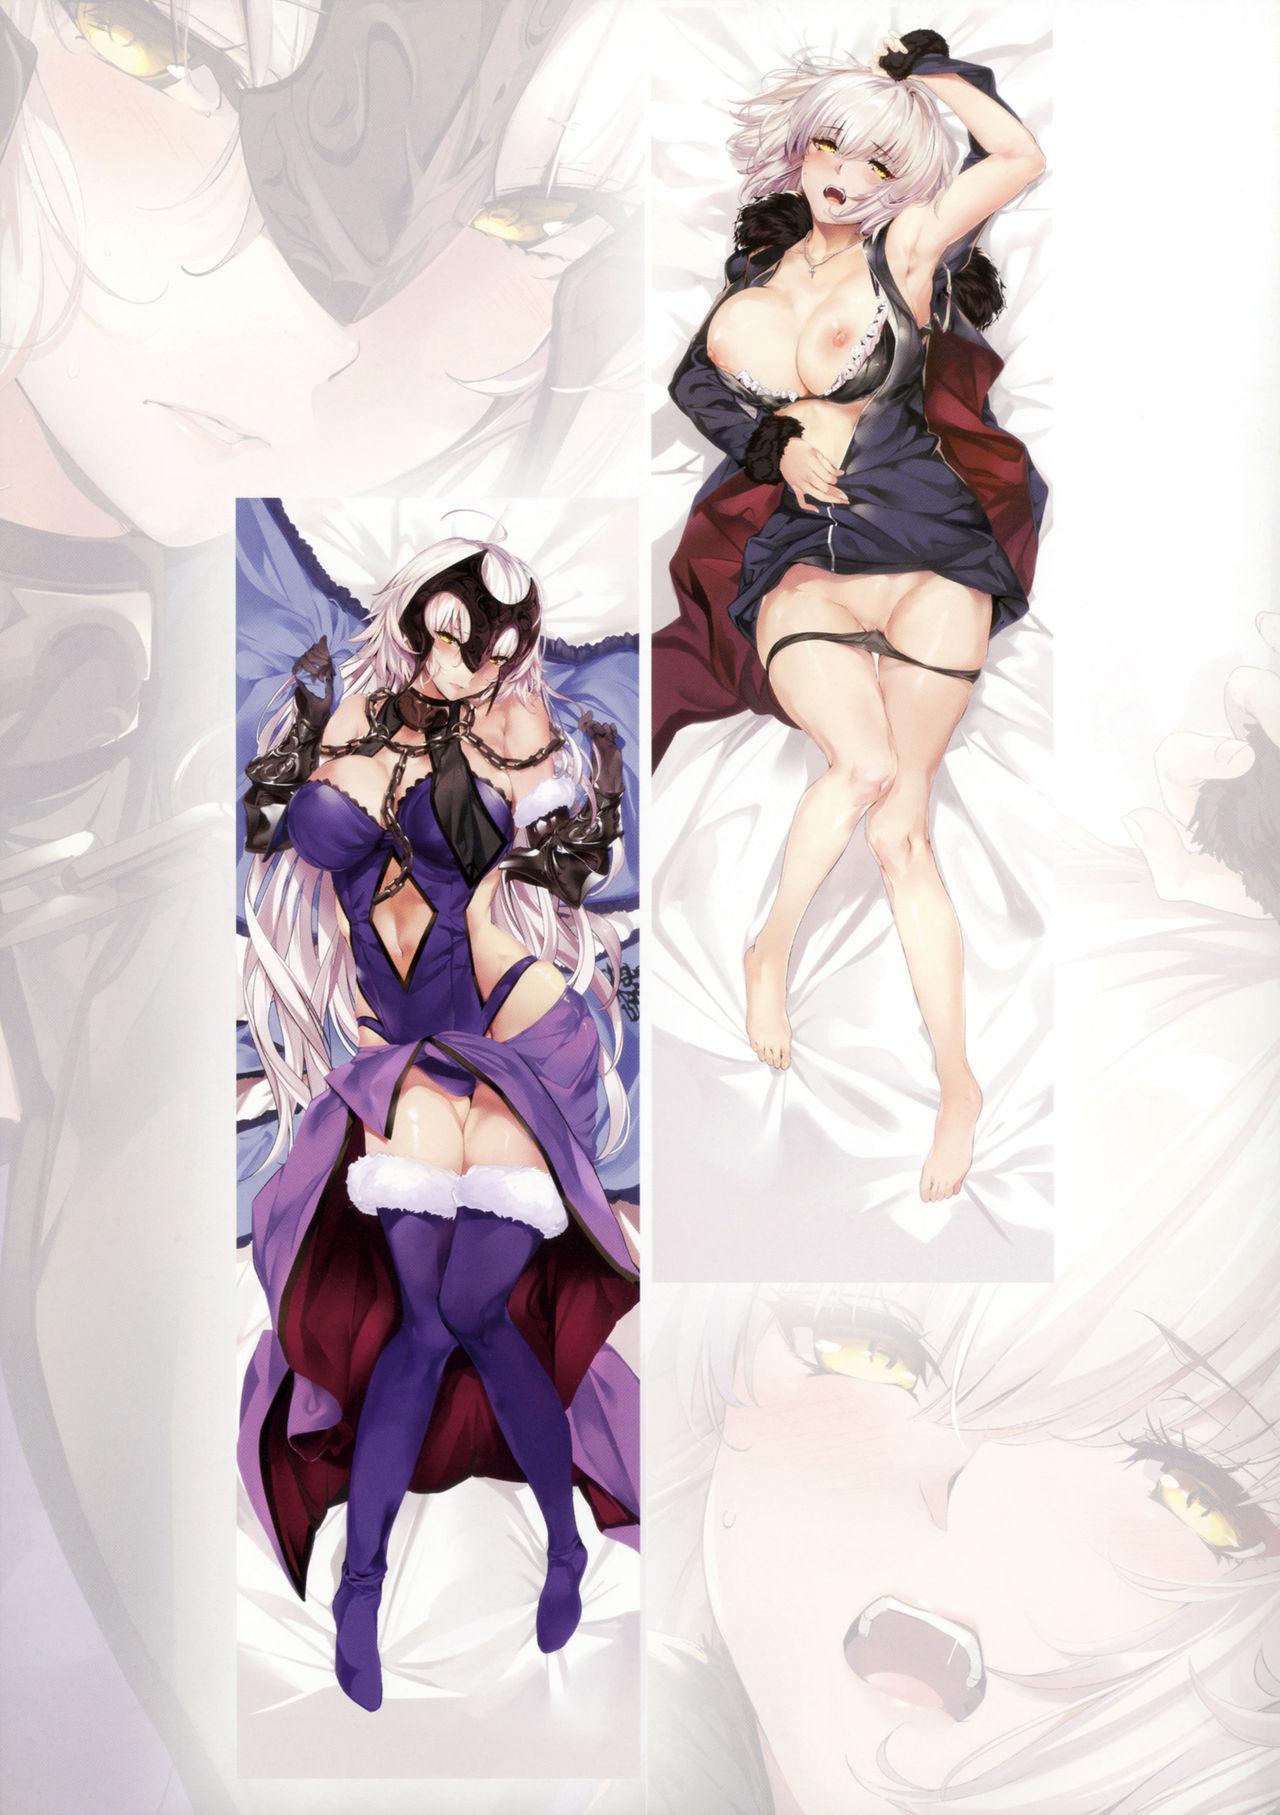 Jeanne Alter ni Onegai Shitai? + Omake Shikishi | Did you ask Jeanne alter? + Bonus Color Page 16